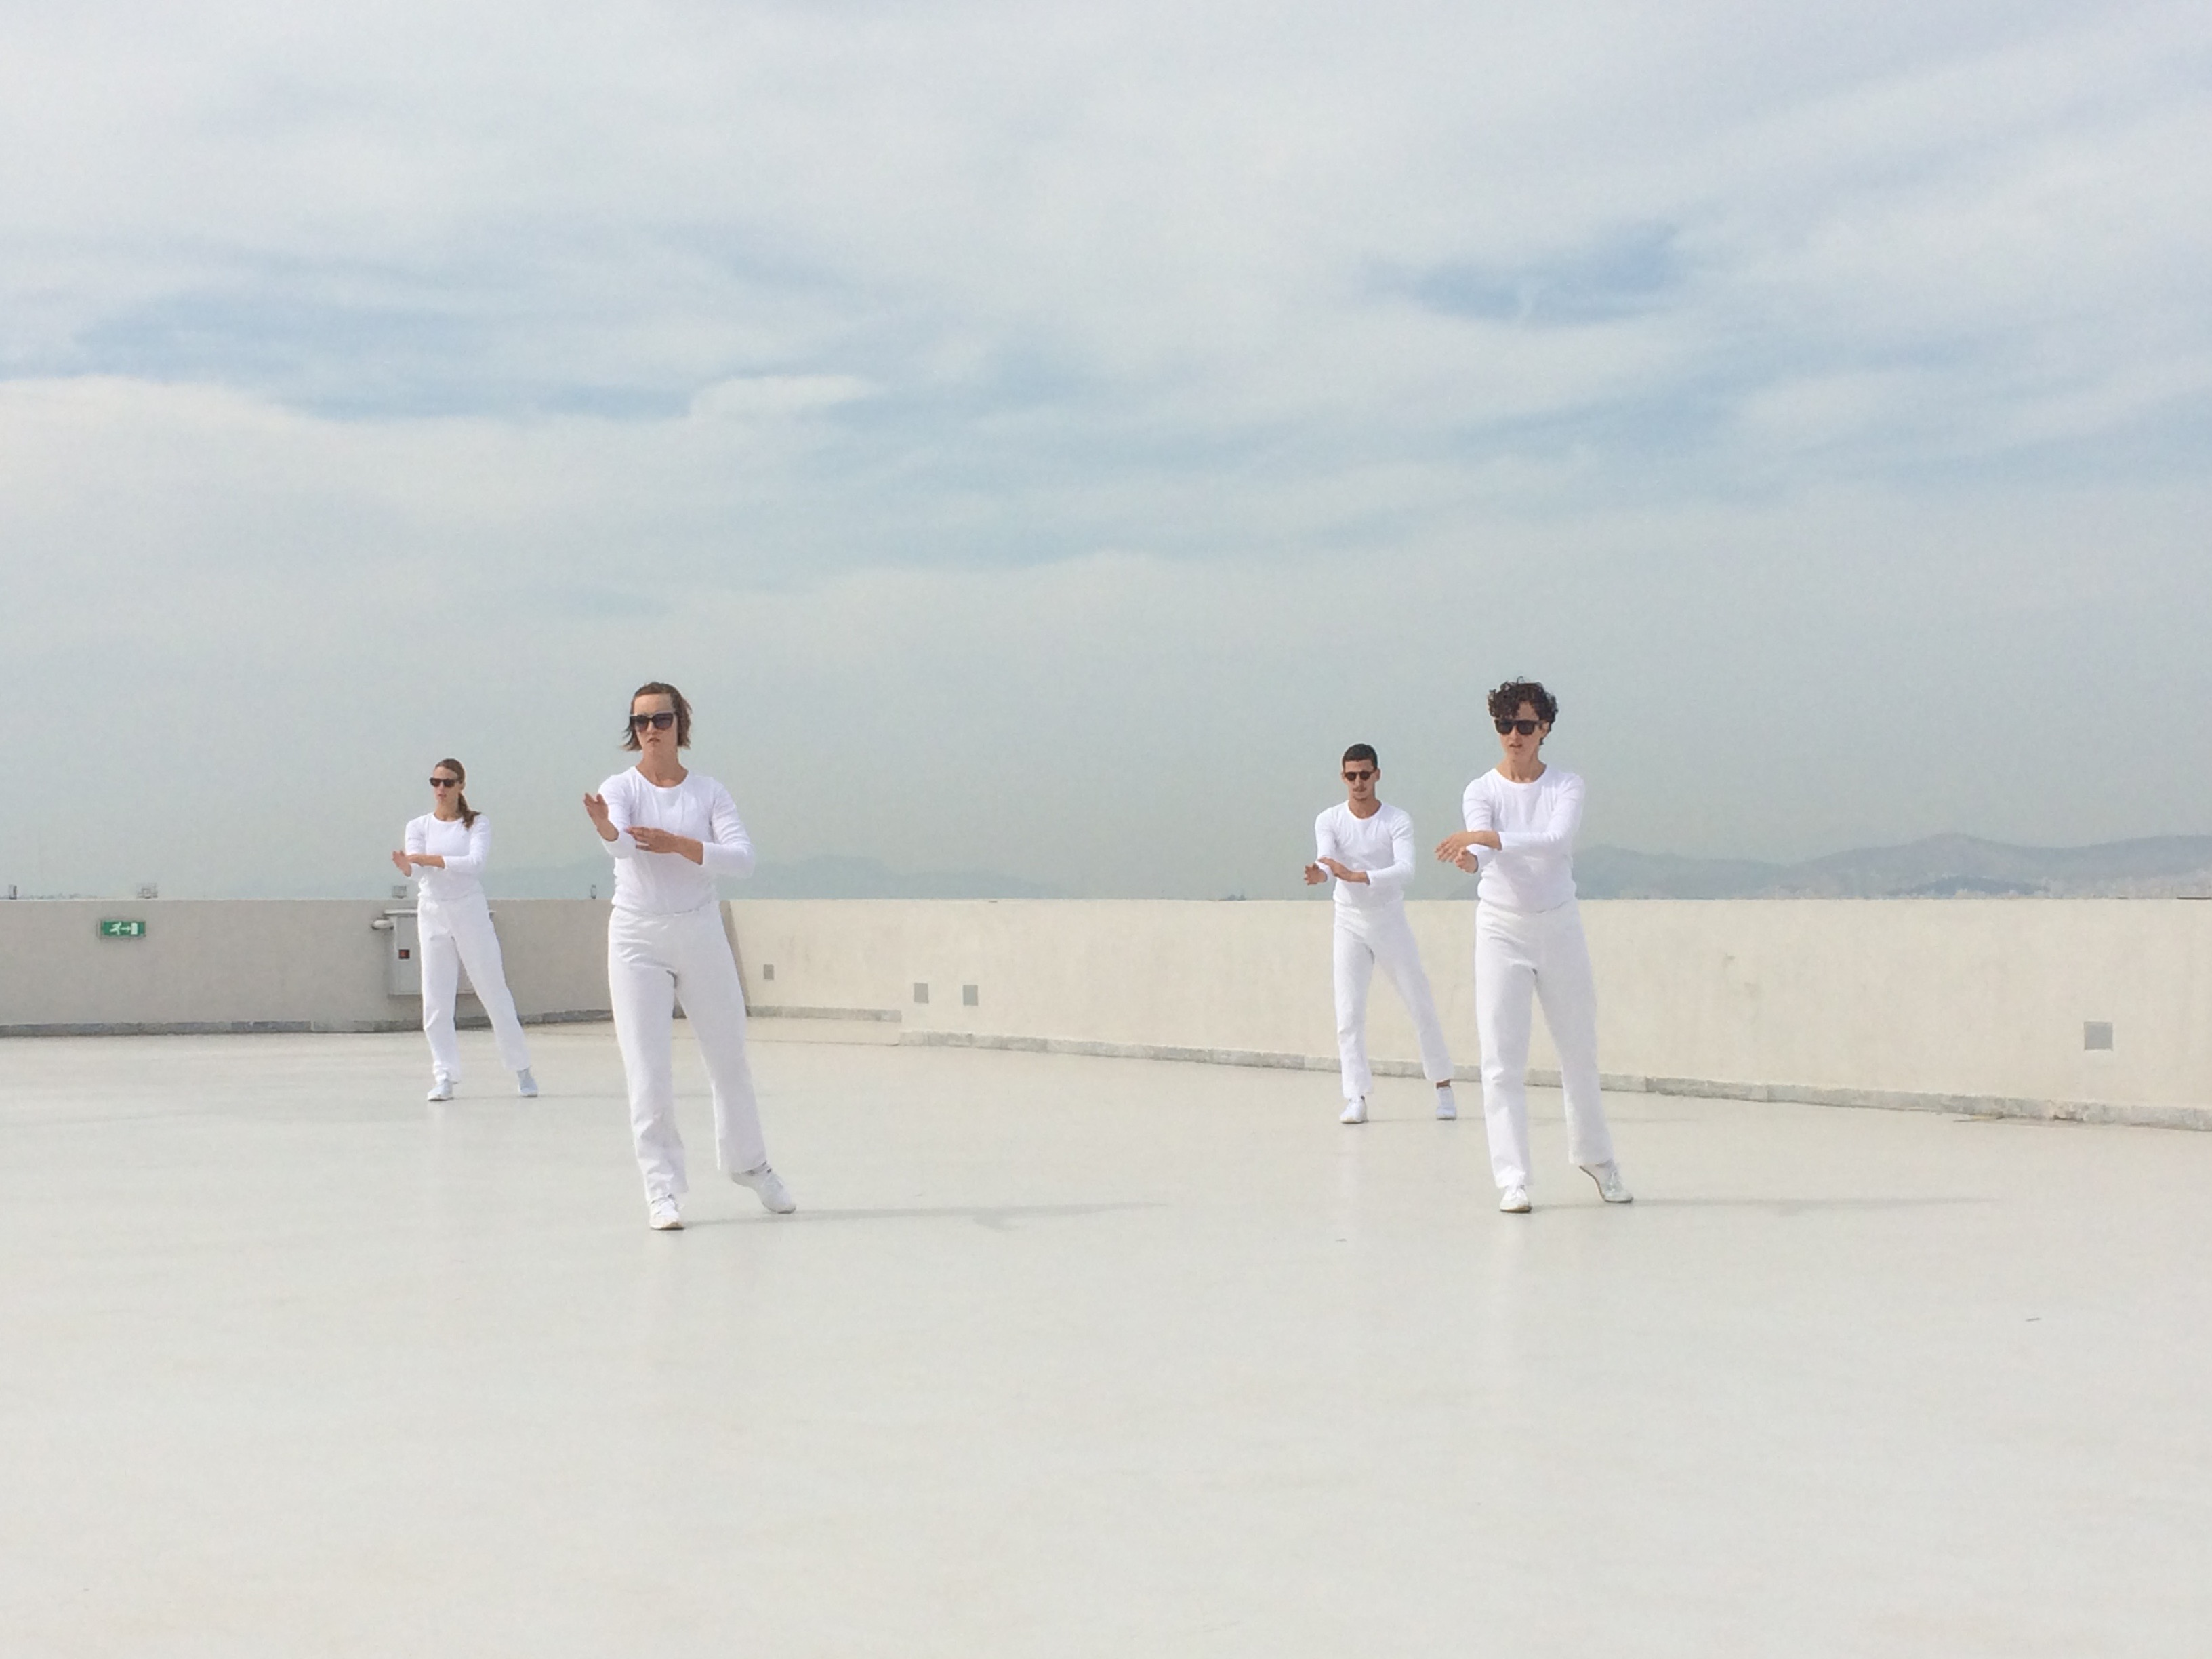 [Trisha Brown Dance CompanyResidency Showing] Andreas Simpoulos